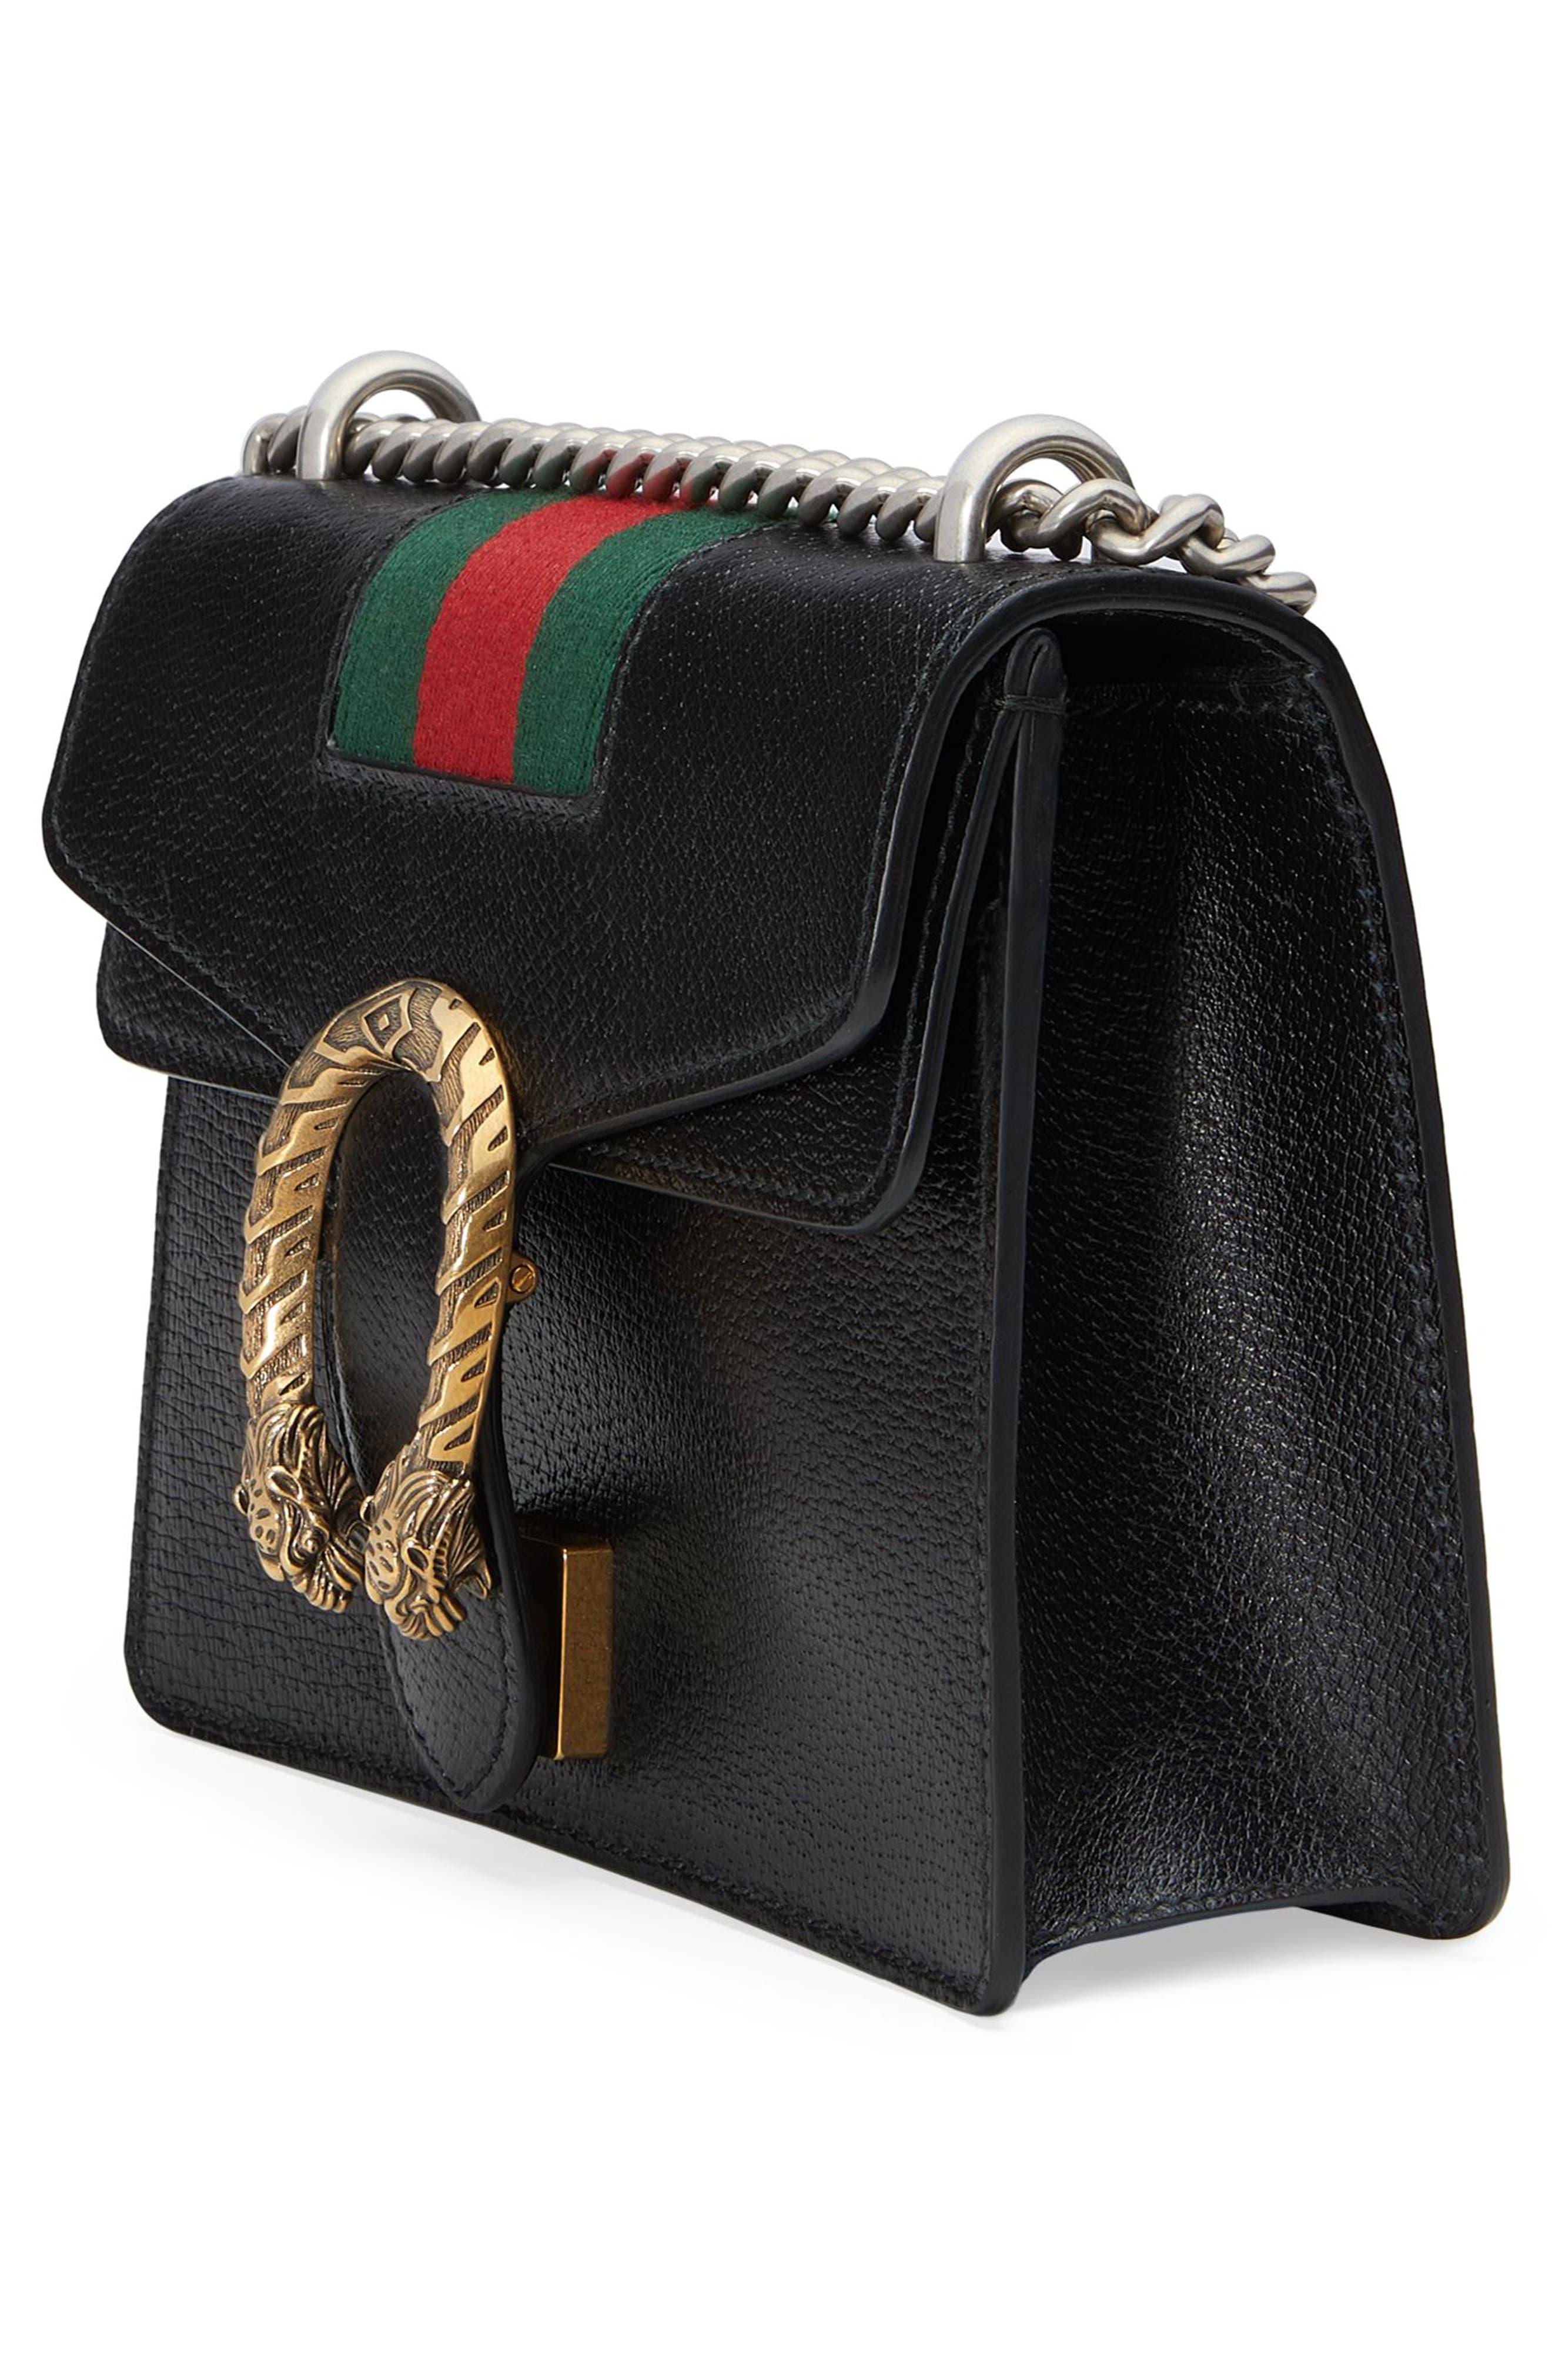 Small Dionysus House Web Leather Shoulder Bag,                             Alternate thumbnail 4, color,                             001